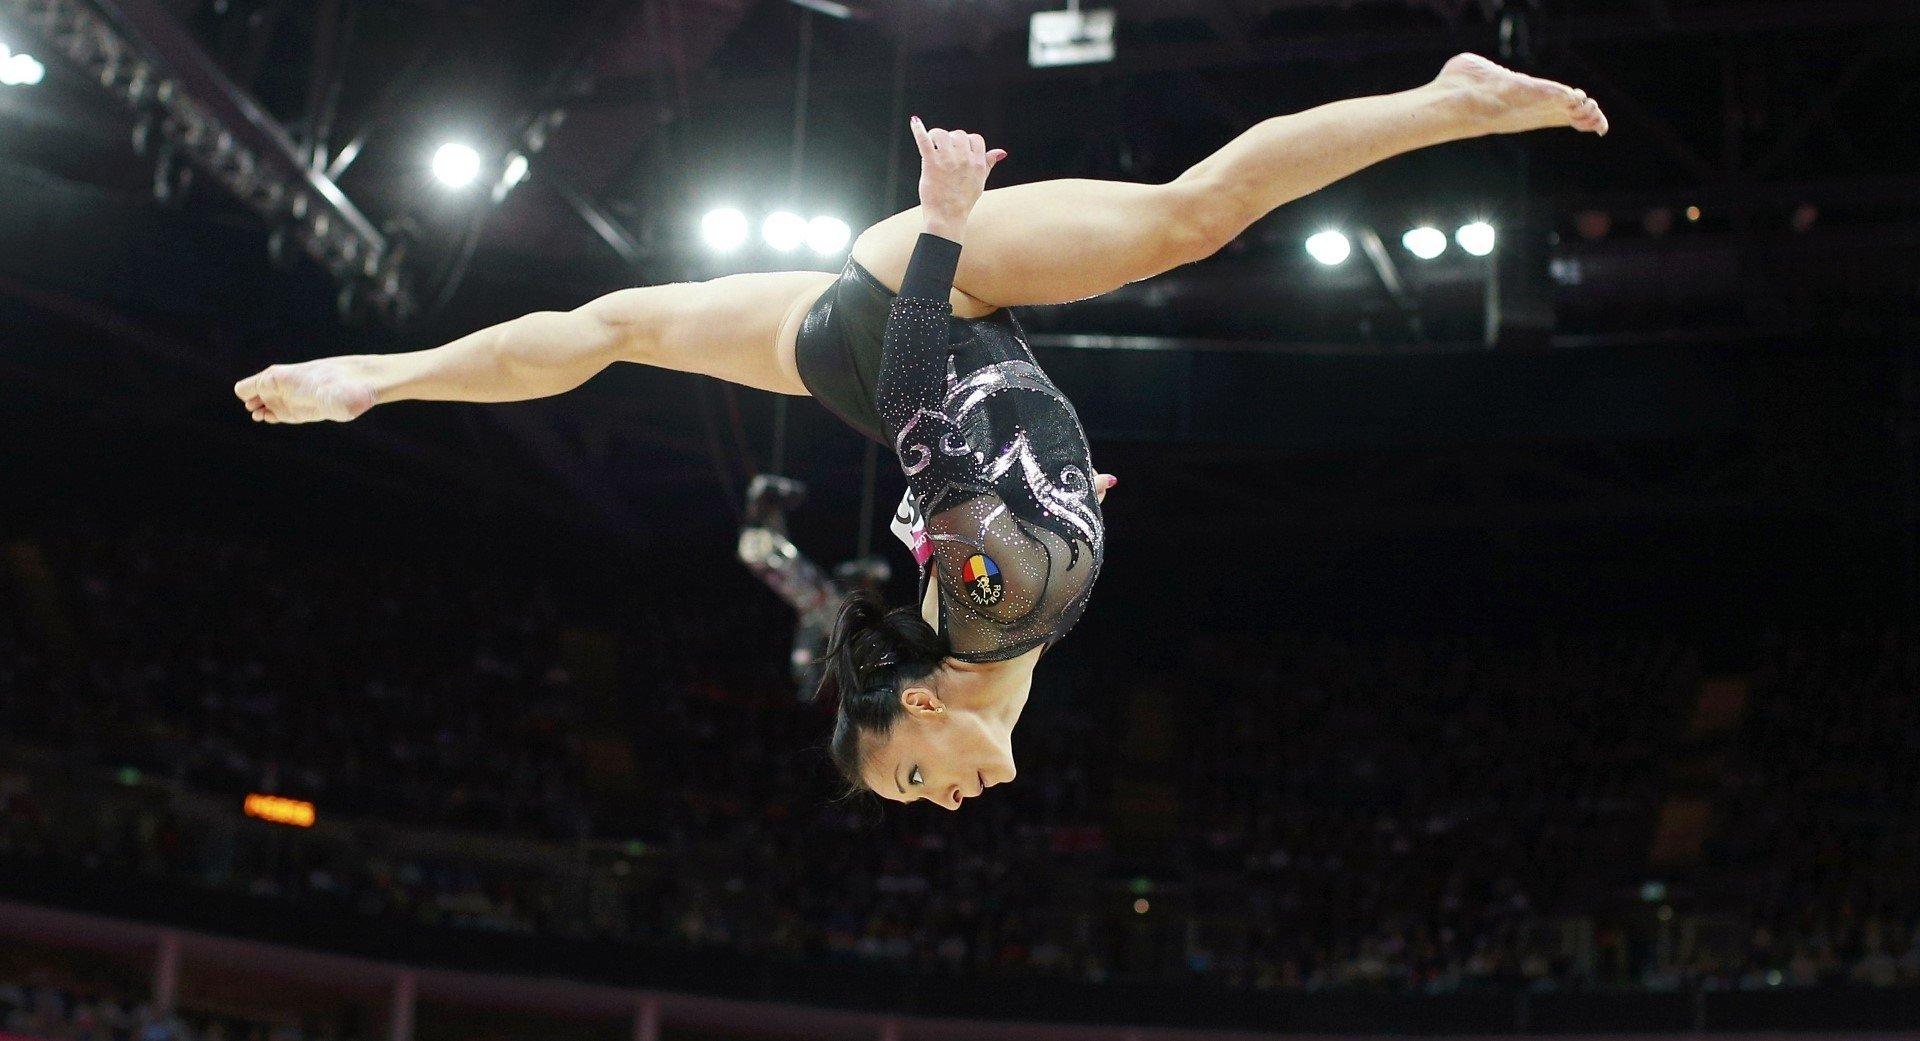 Wallpaper Pc Mobile Sport: Women, Sports, Gymnastics HD Wallpapers / Desktop And